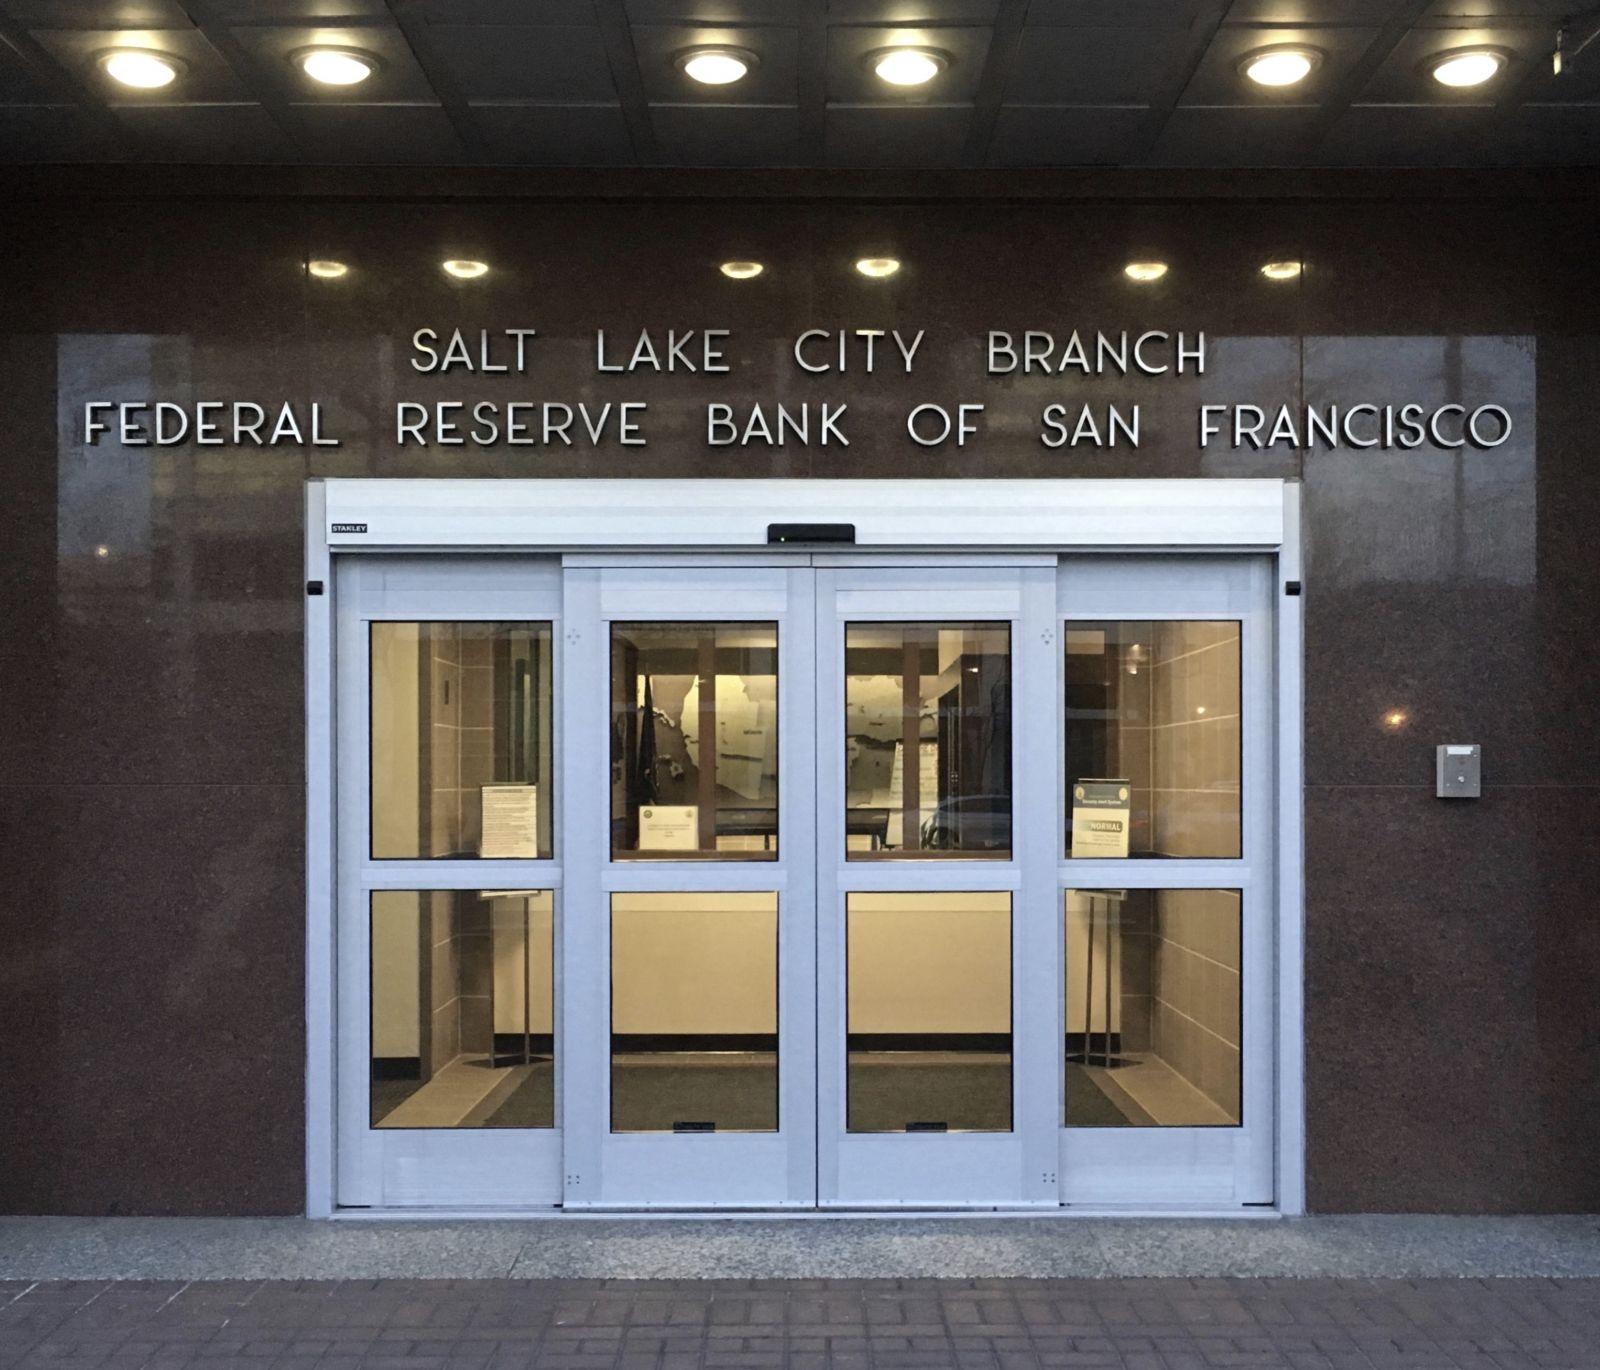 Salt Lake City Branch Federal Reserve Bank of San Francisco | Flickr - Photo Sharing!